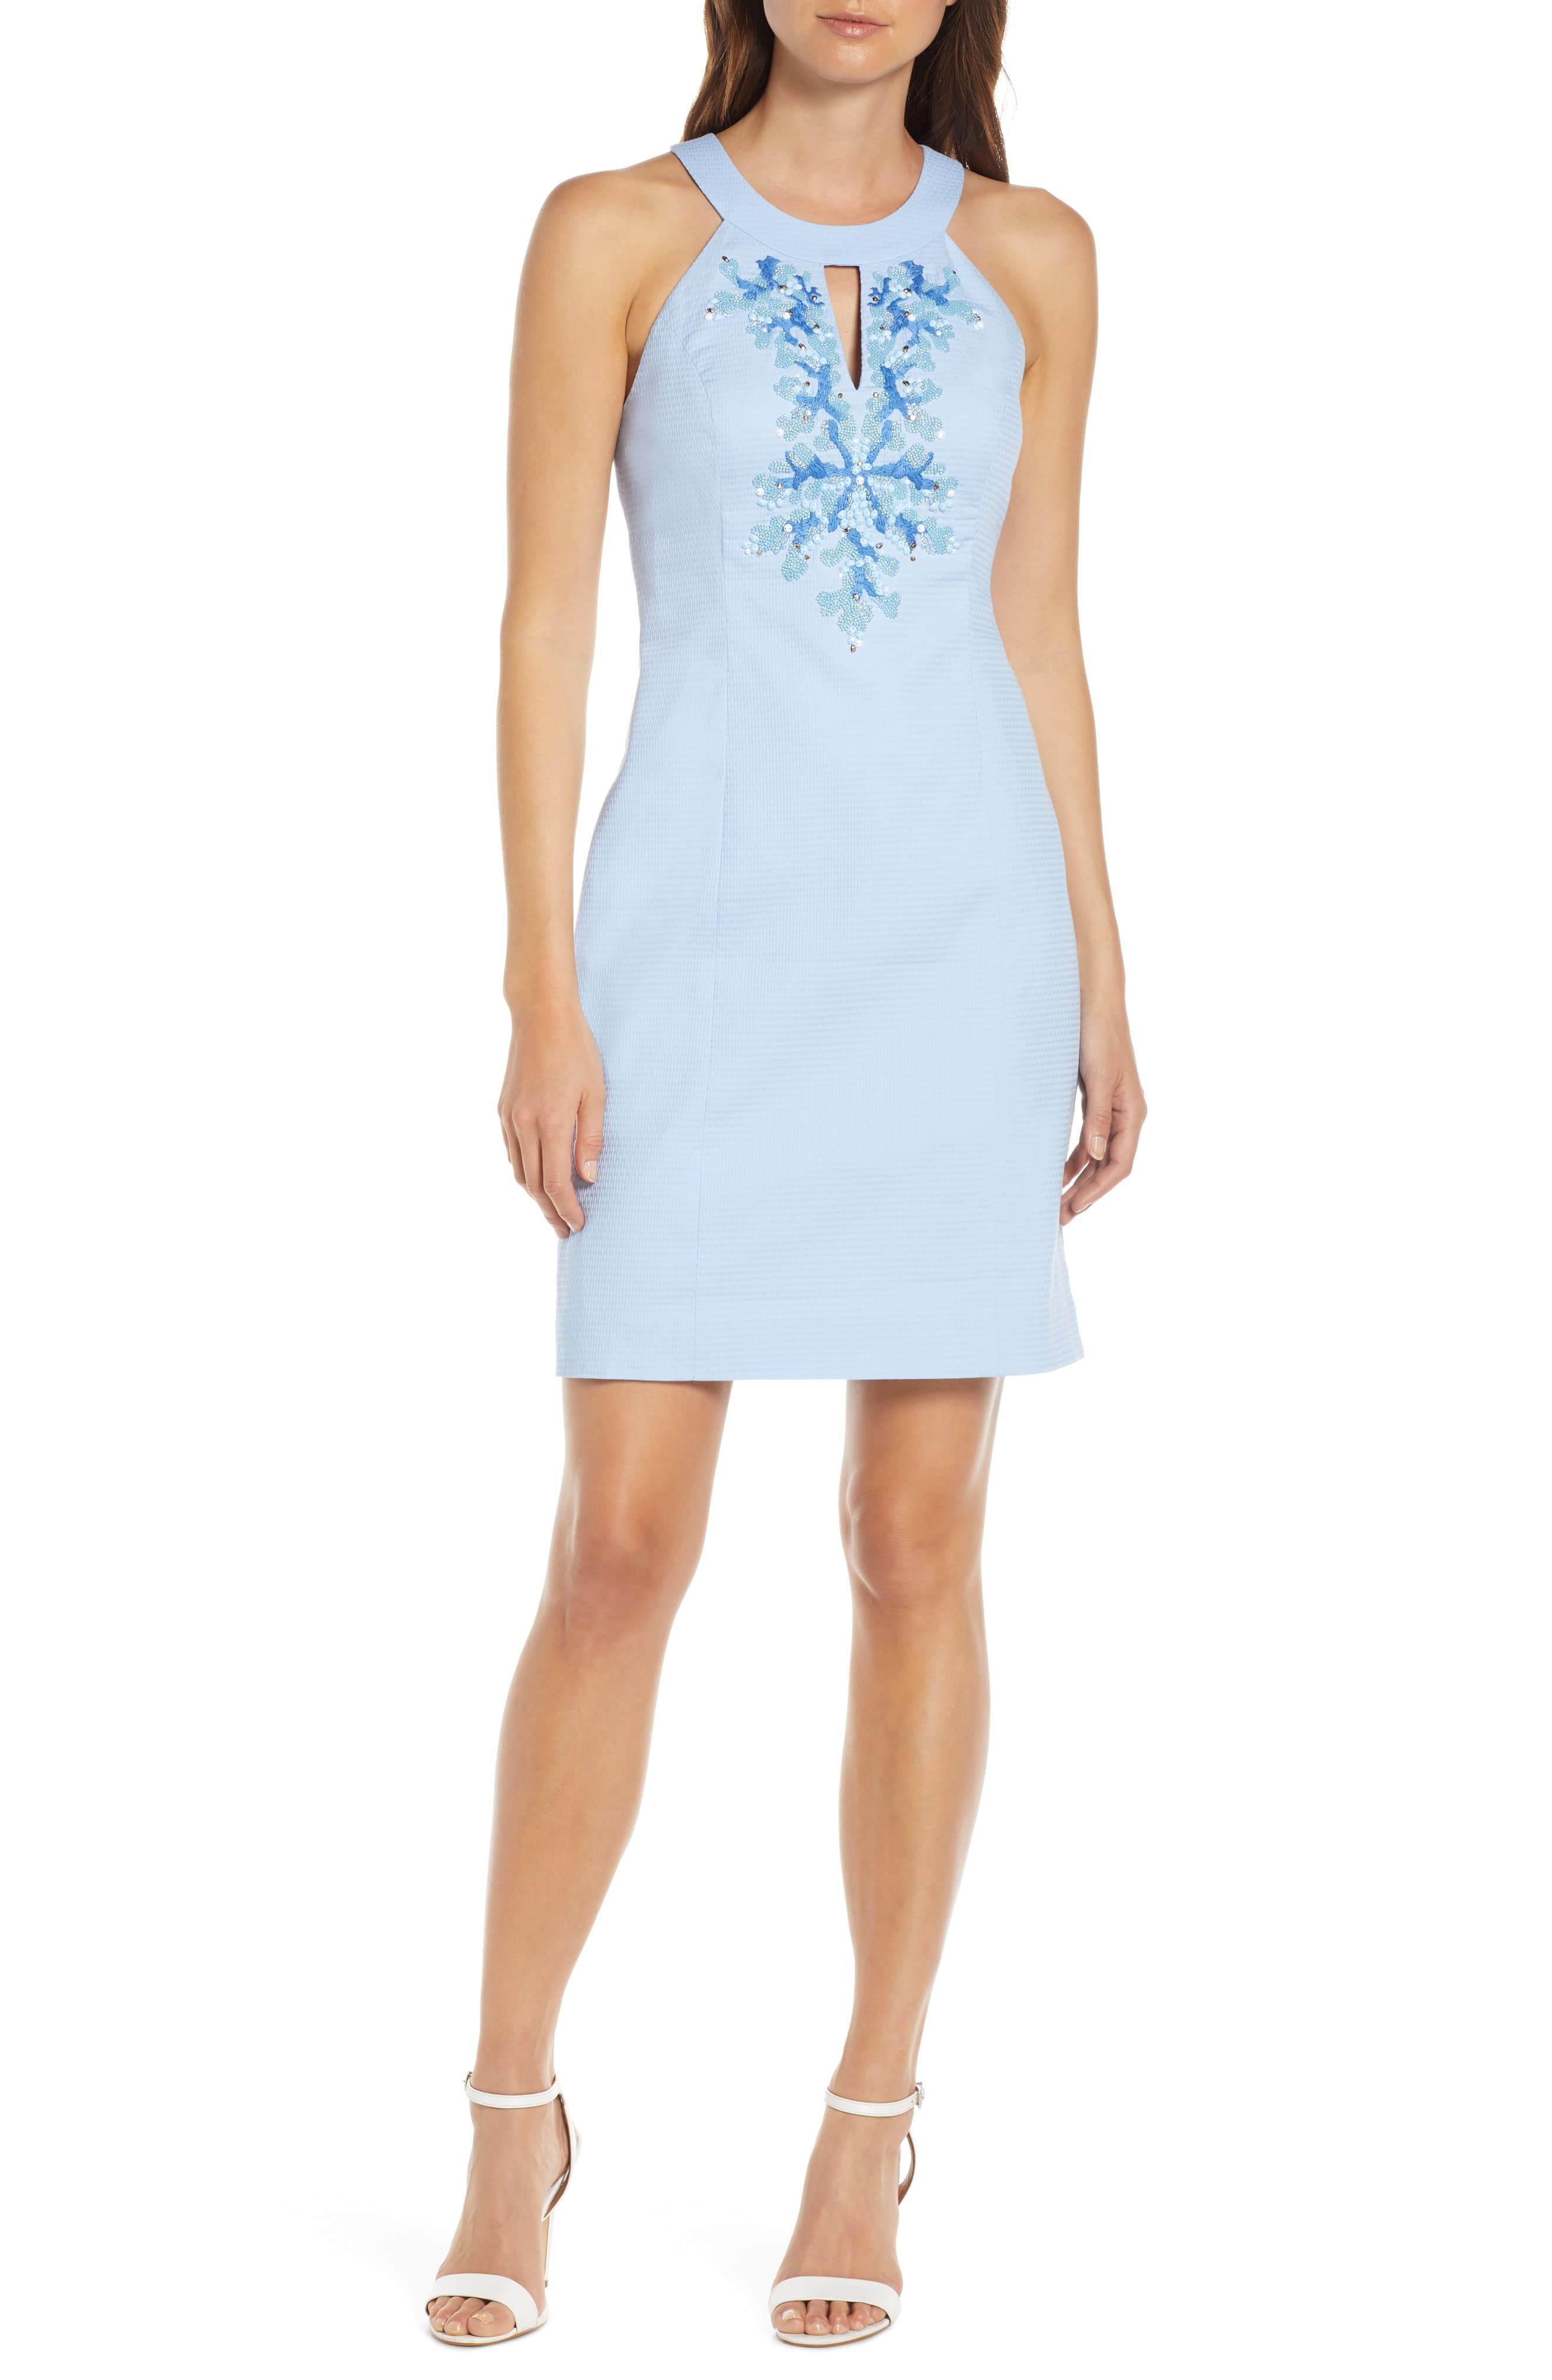 Lilly Pulitzer Jena Beaded Sheath Dress Nordstrom Trendy Cocktail Dresses Women S Fashion Dresses Fashion Clothes Women [ 4048 x 2640 Pixel ]